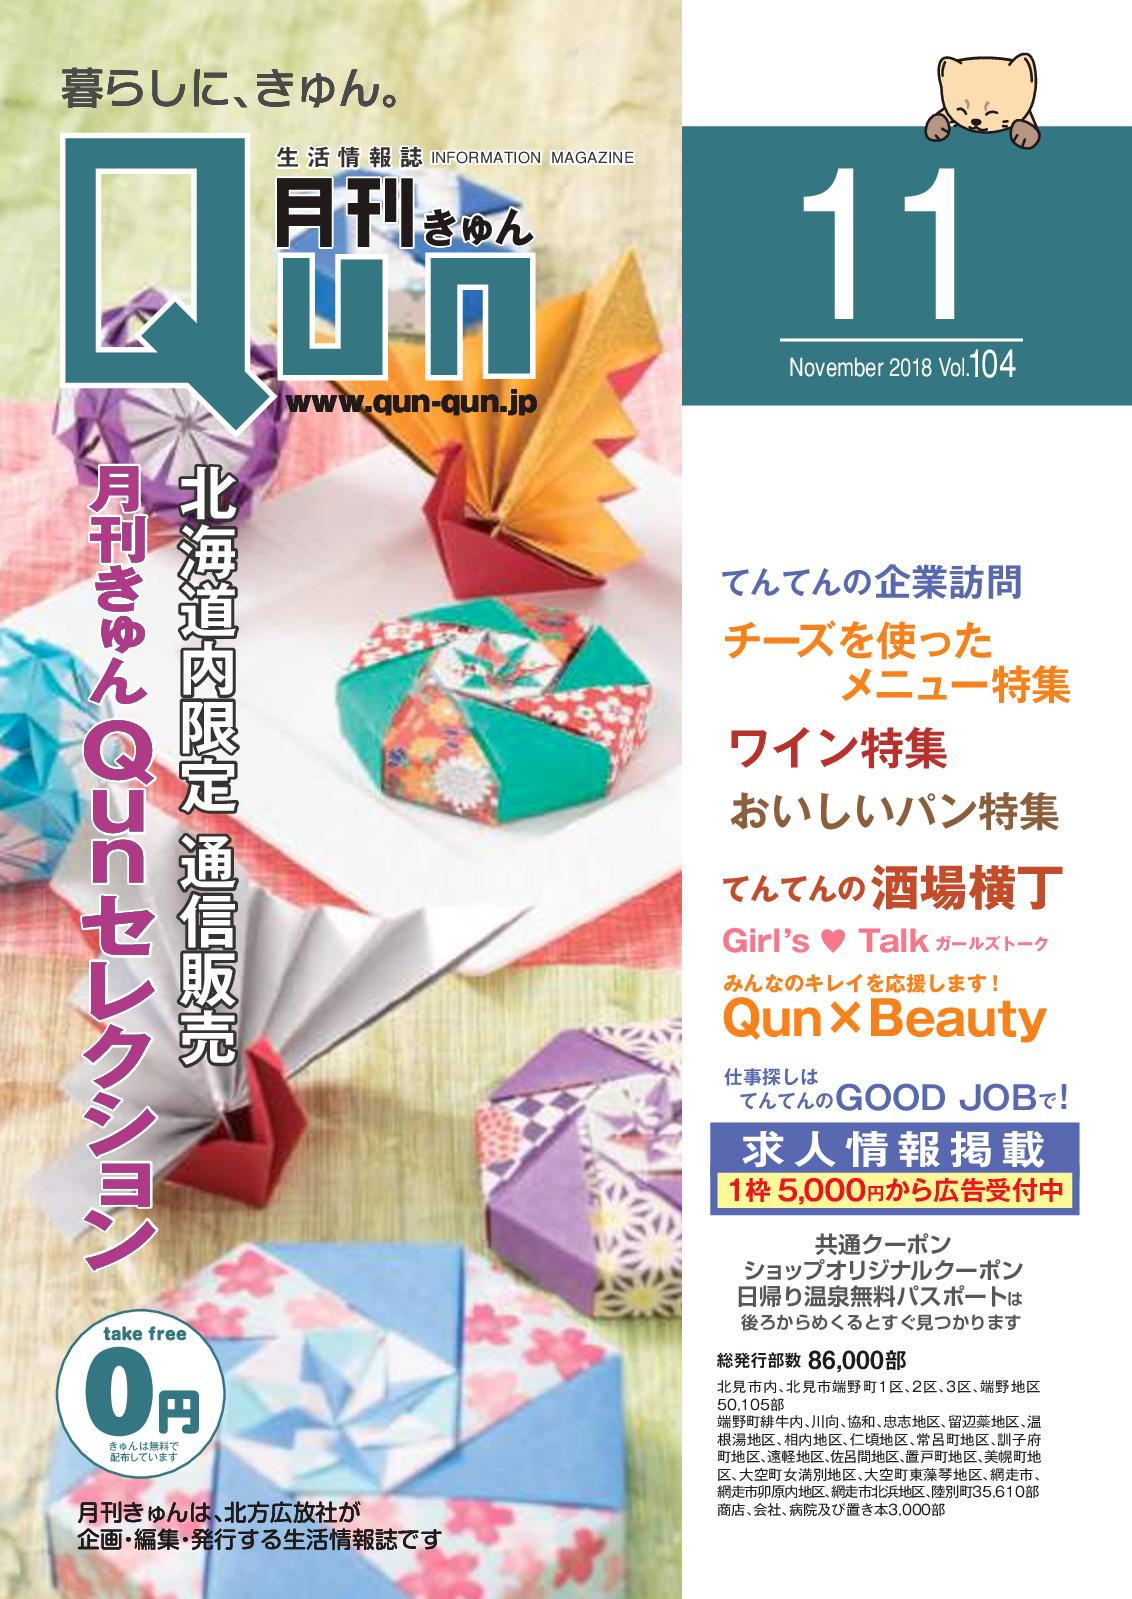 9640ad94b8 Calaméo - 月刊Qunきゅん 2018年11月号vol.104